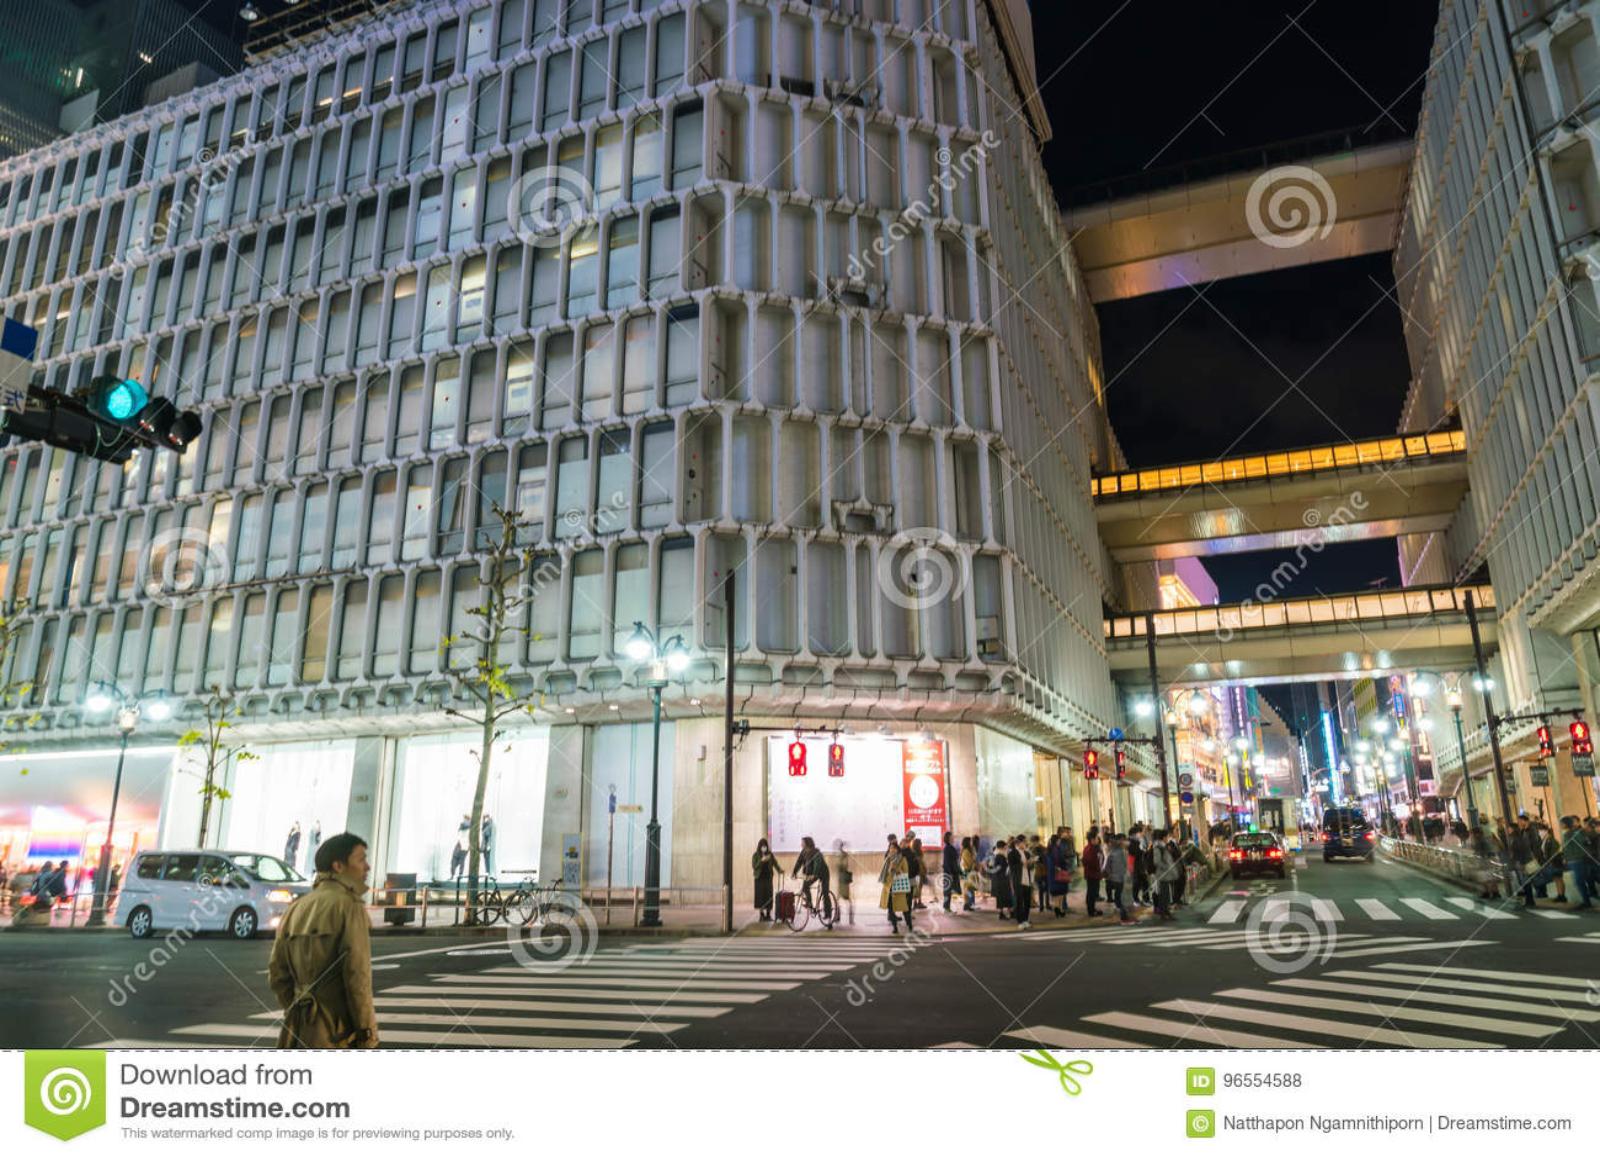 31d074df1 Tokyo, Japan, Nov 17, 2016: Shibuya Crossing Of City street with crowd  people on zebra crosswalk in Shibuya town. Shibuya is a special ward  located in Tokyo ...